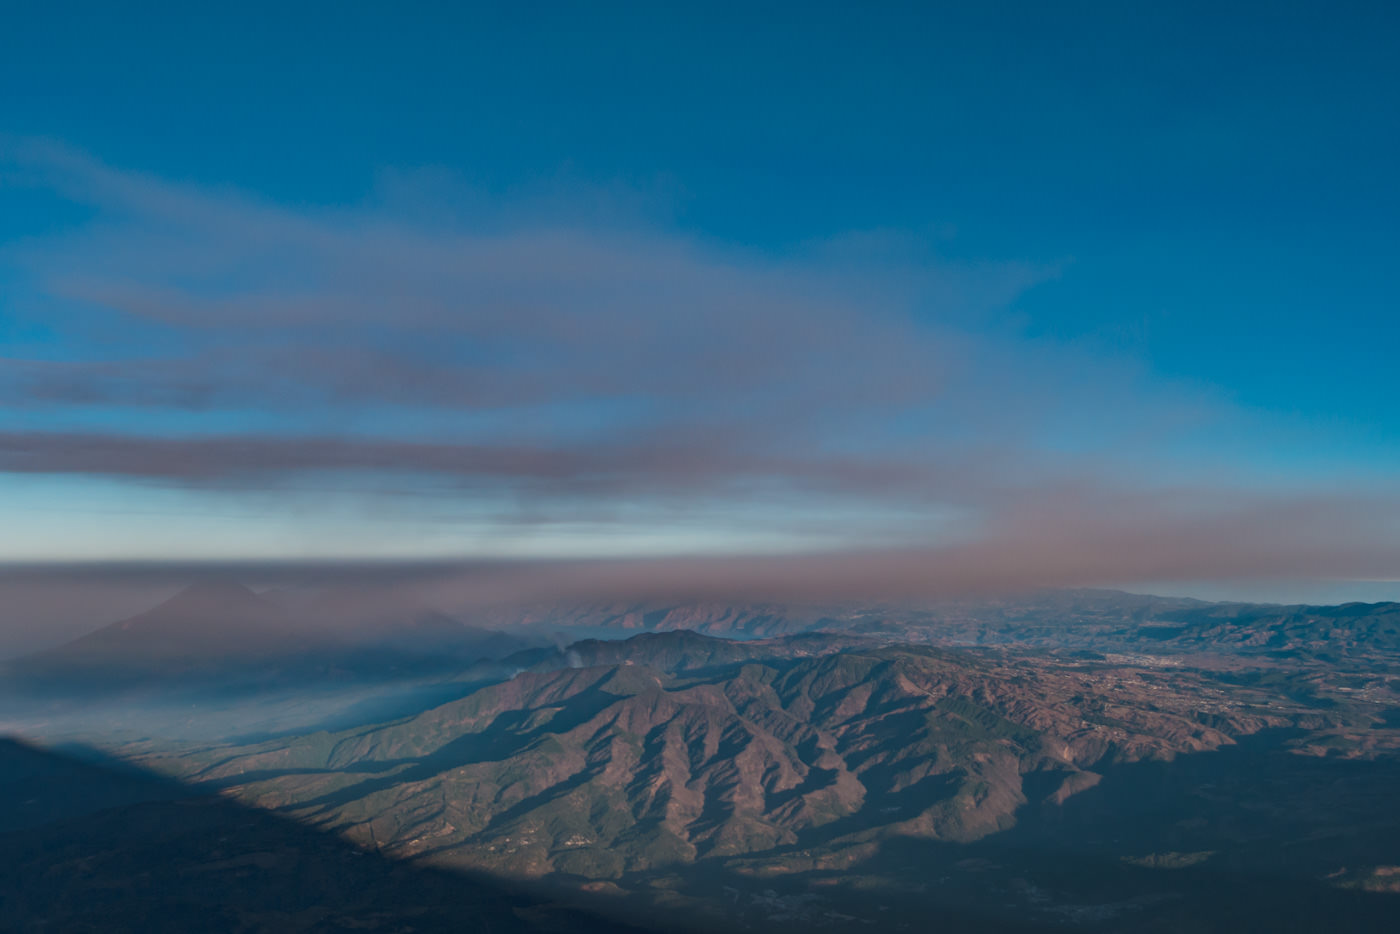 Ausblick vom Vulkan Acatenango auf den See Atitlán